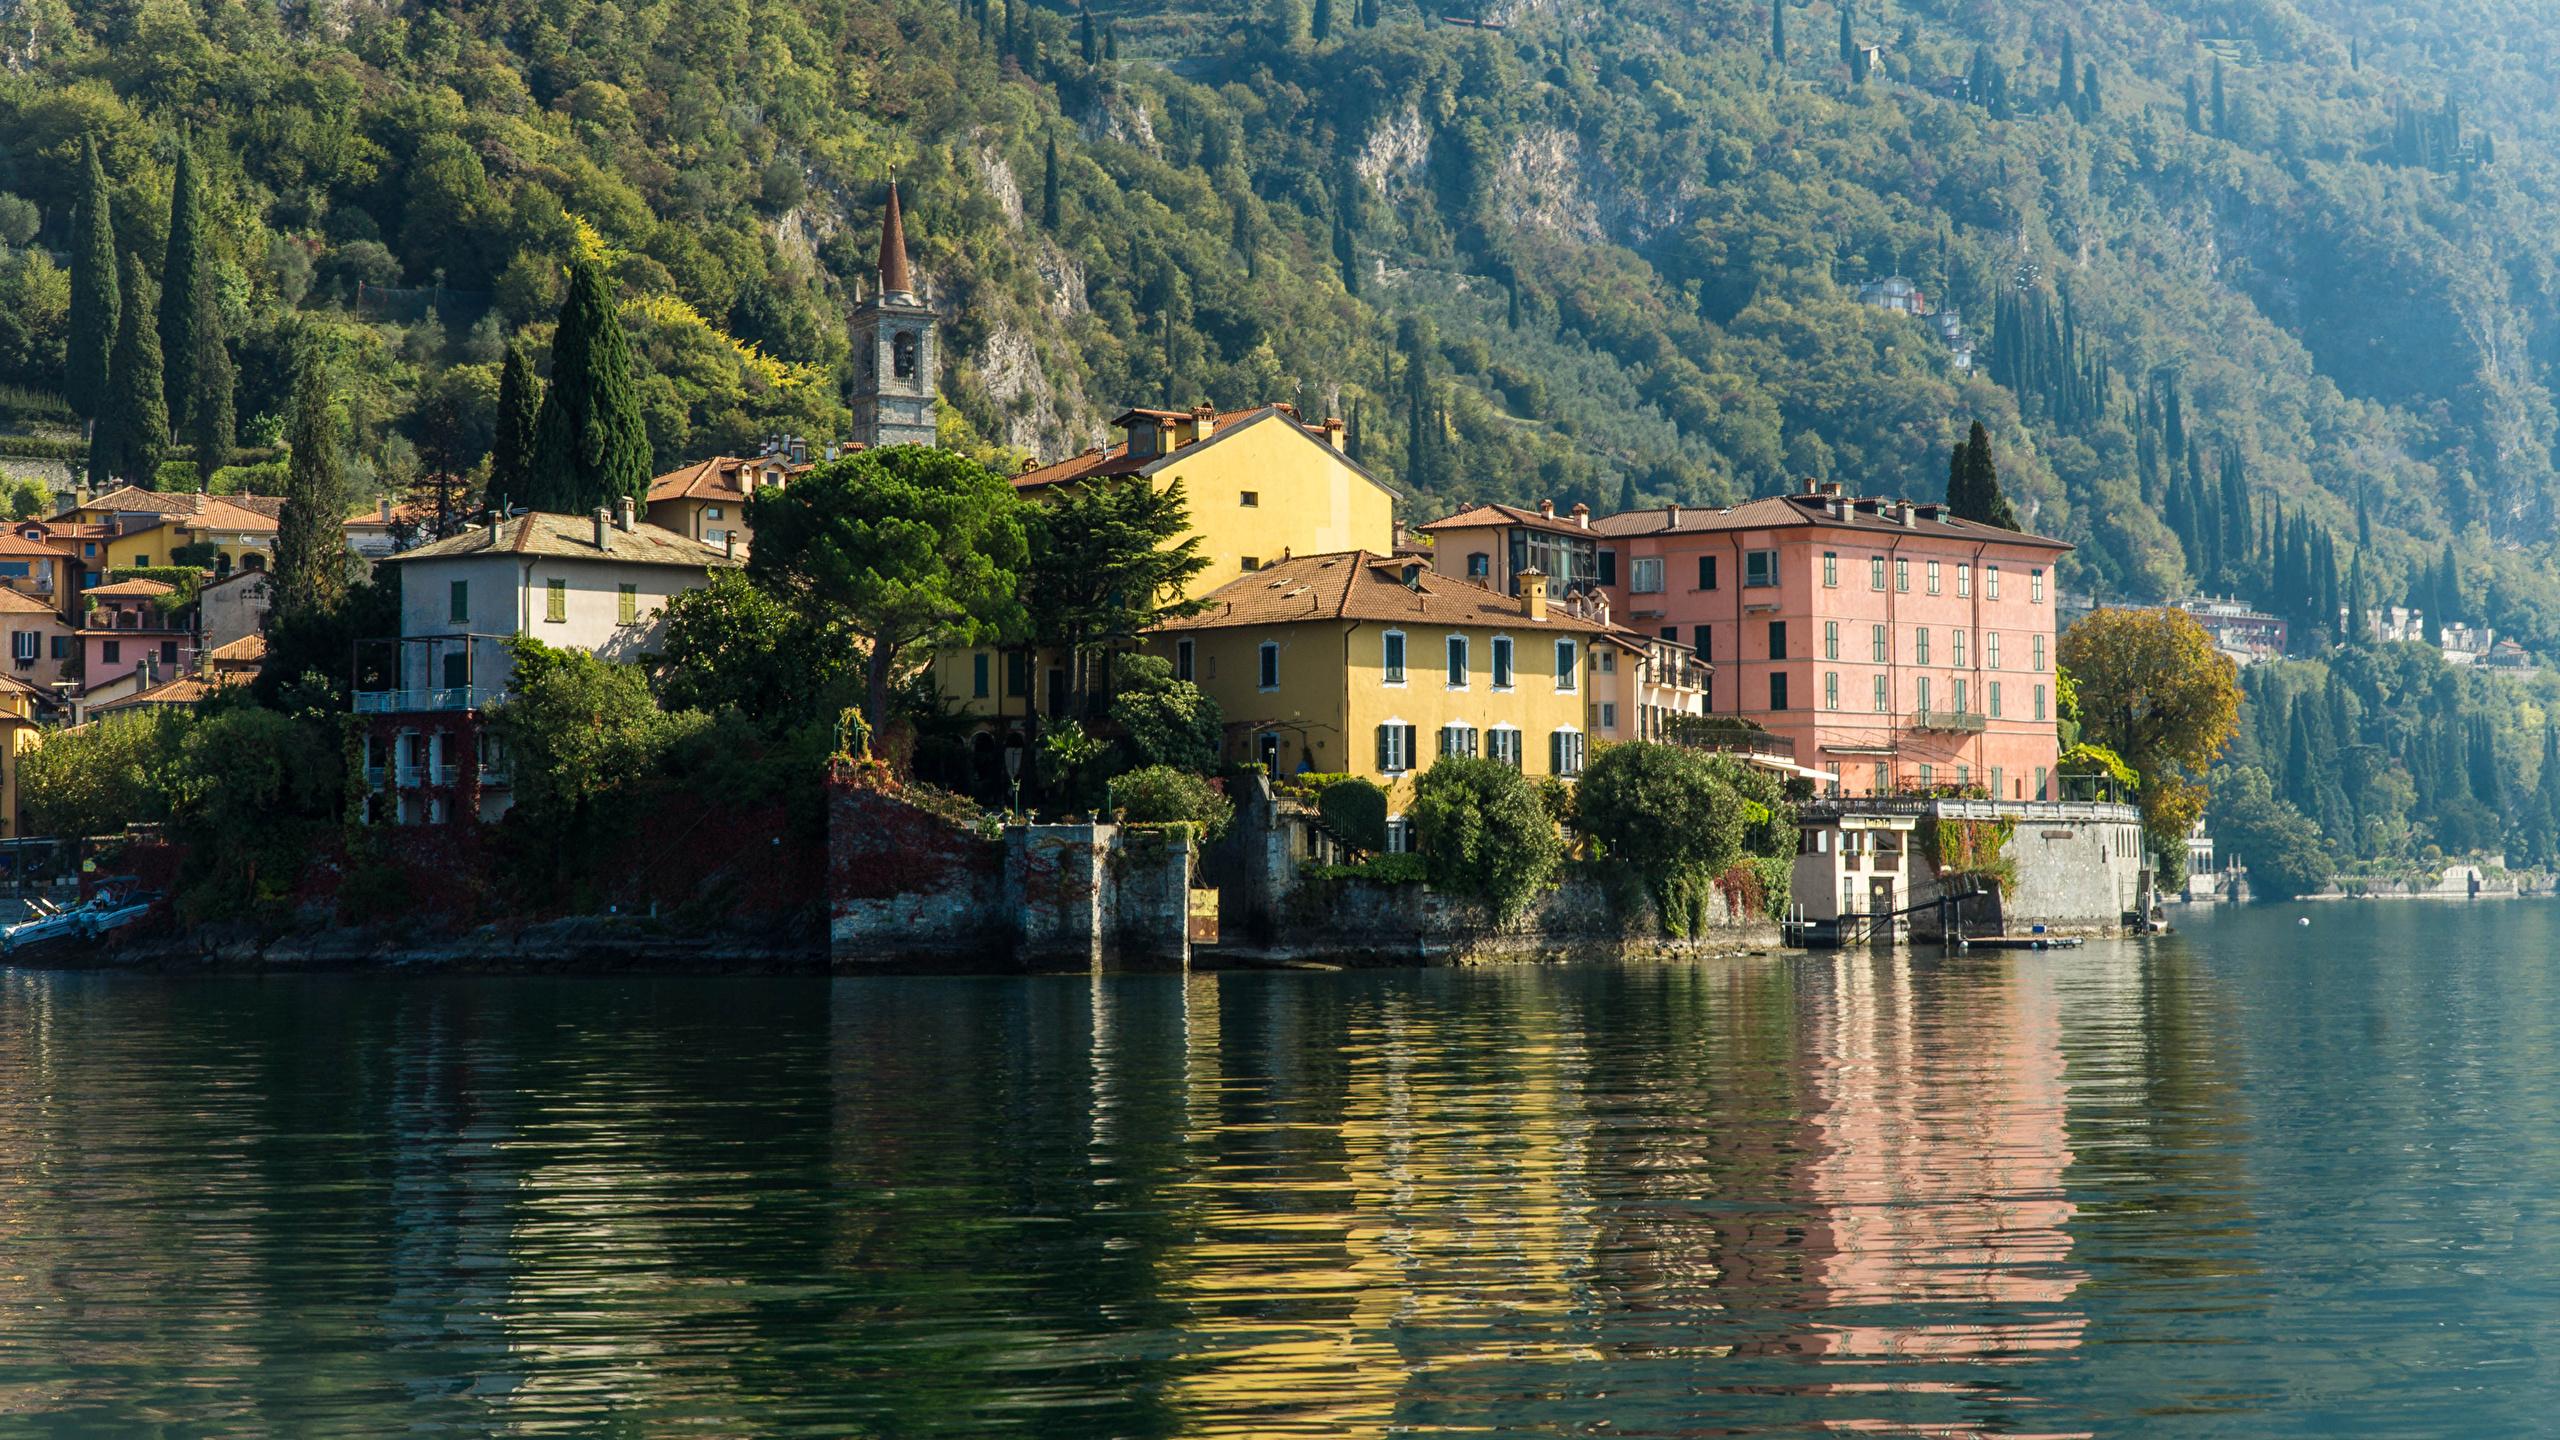 Картинка Италия Varenna Lake Como Озеро Дома Города 2560x1440 город Здания